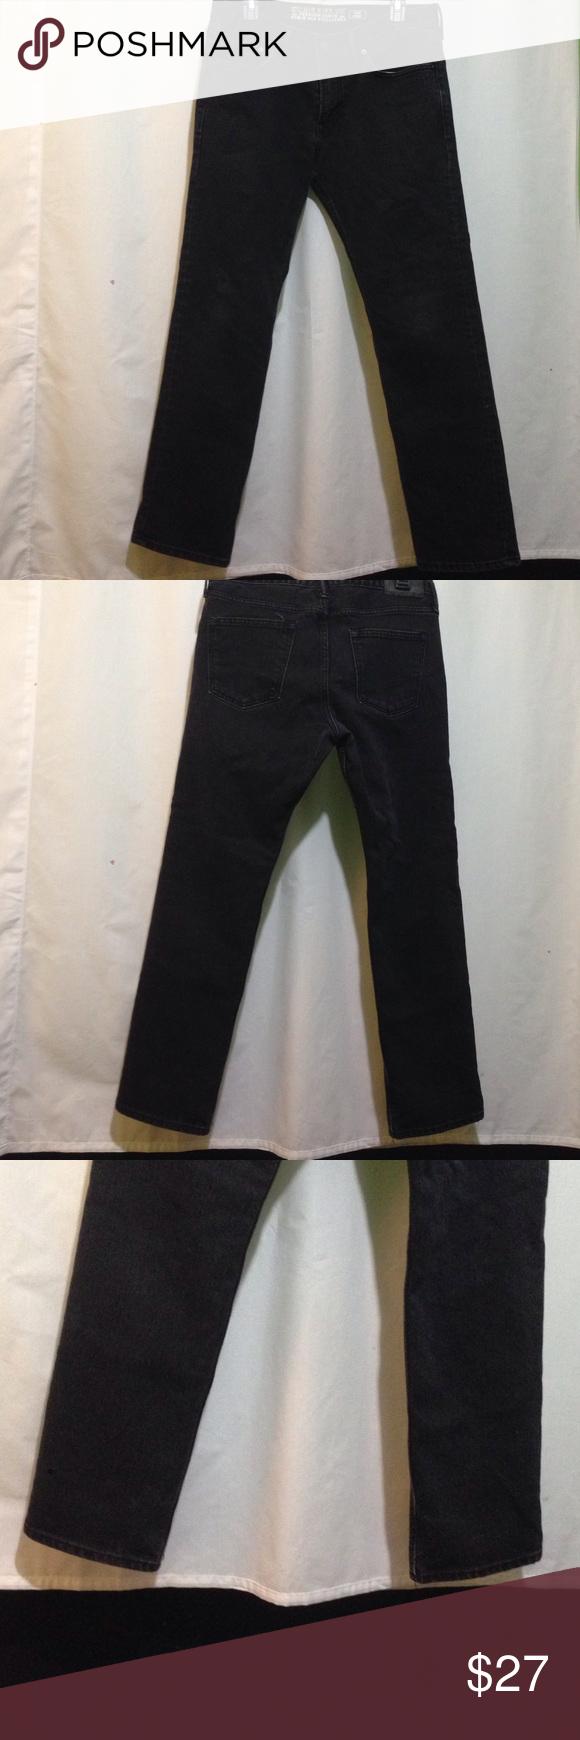 Men's old navy pants 👖 Men's old navy pants 👖 NWOT 32X30 Old Navy Jeans Slim